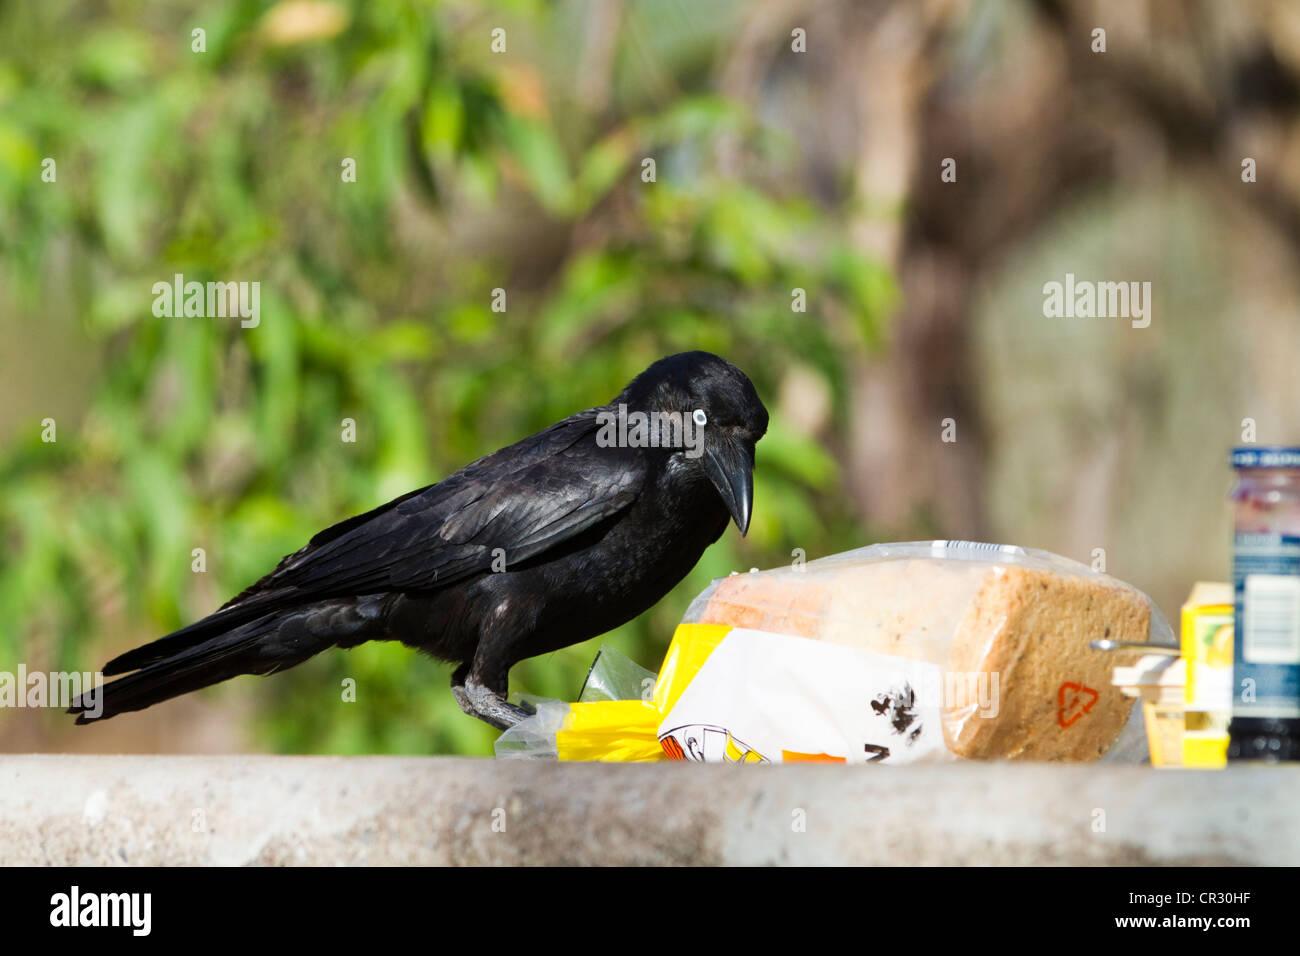 Australian raven (Corvus coronoides) stealing bread, Kakadu National Park, Northern Territory, Australia - Stock Image